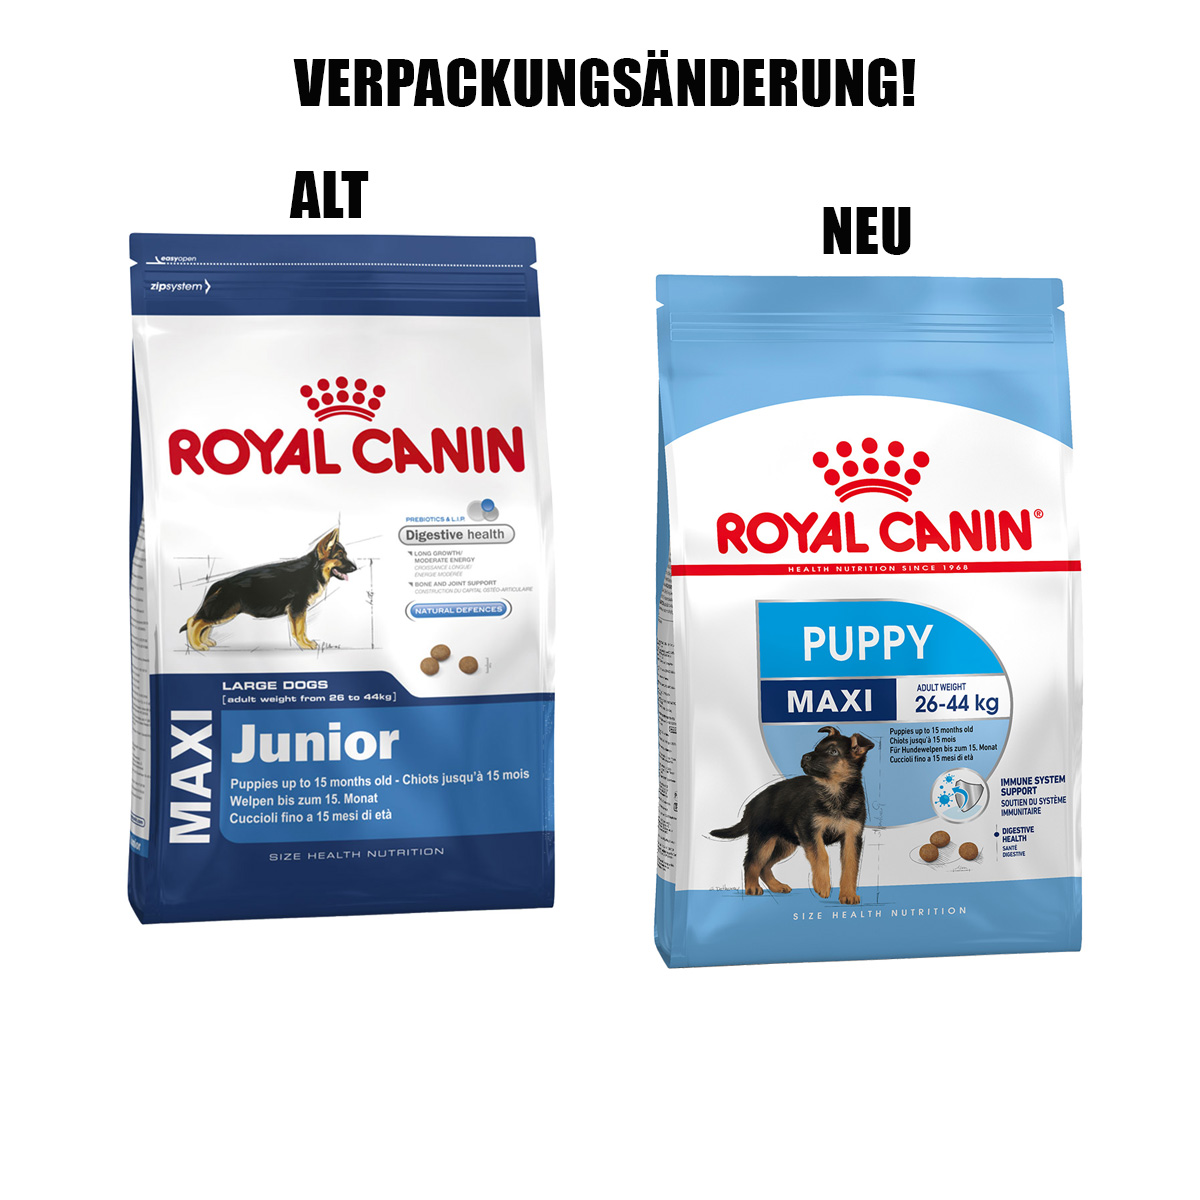 royal canin maxi puppy g nstig kaufen bei zooroyal. Black Bedroom Furniture Sets. Home Design Ideas